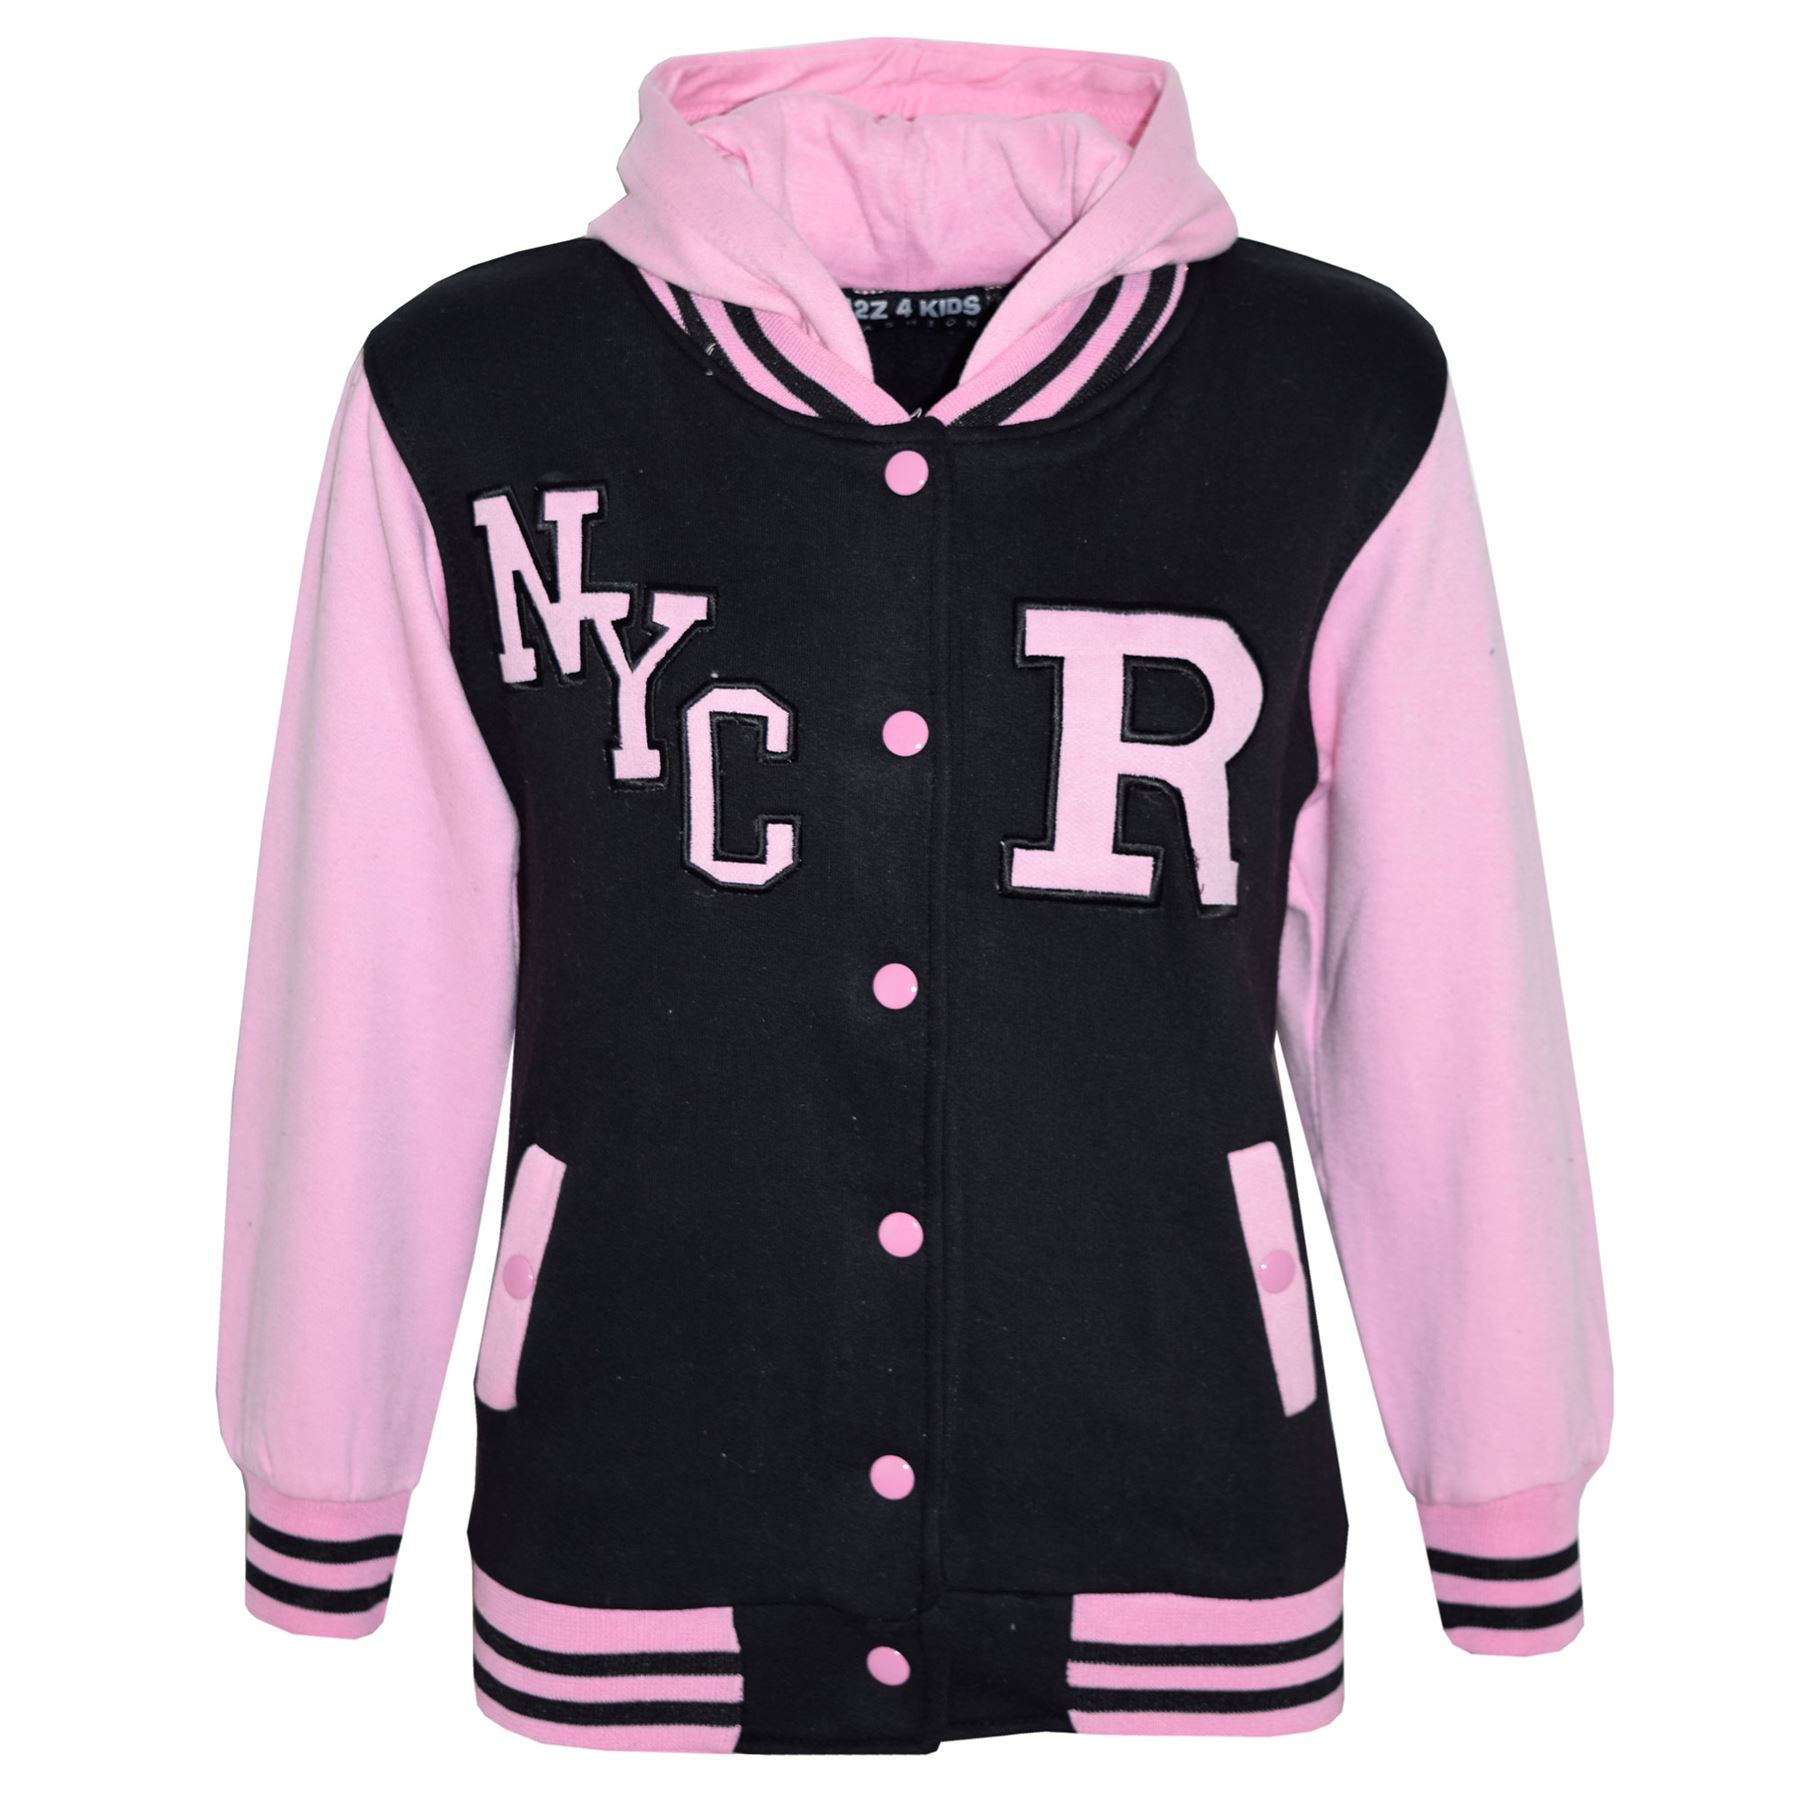 Enfants-filles-garcons-r-fashion-nyc-baseball-veste-a-capuche-varsity-sweat-a-capuche-5-13-ans